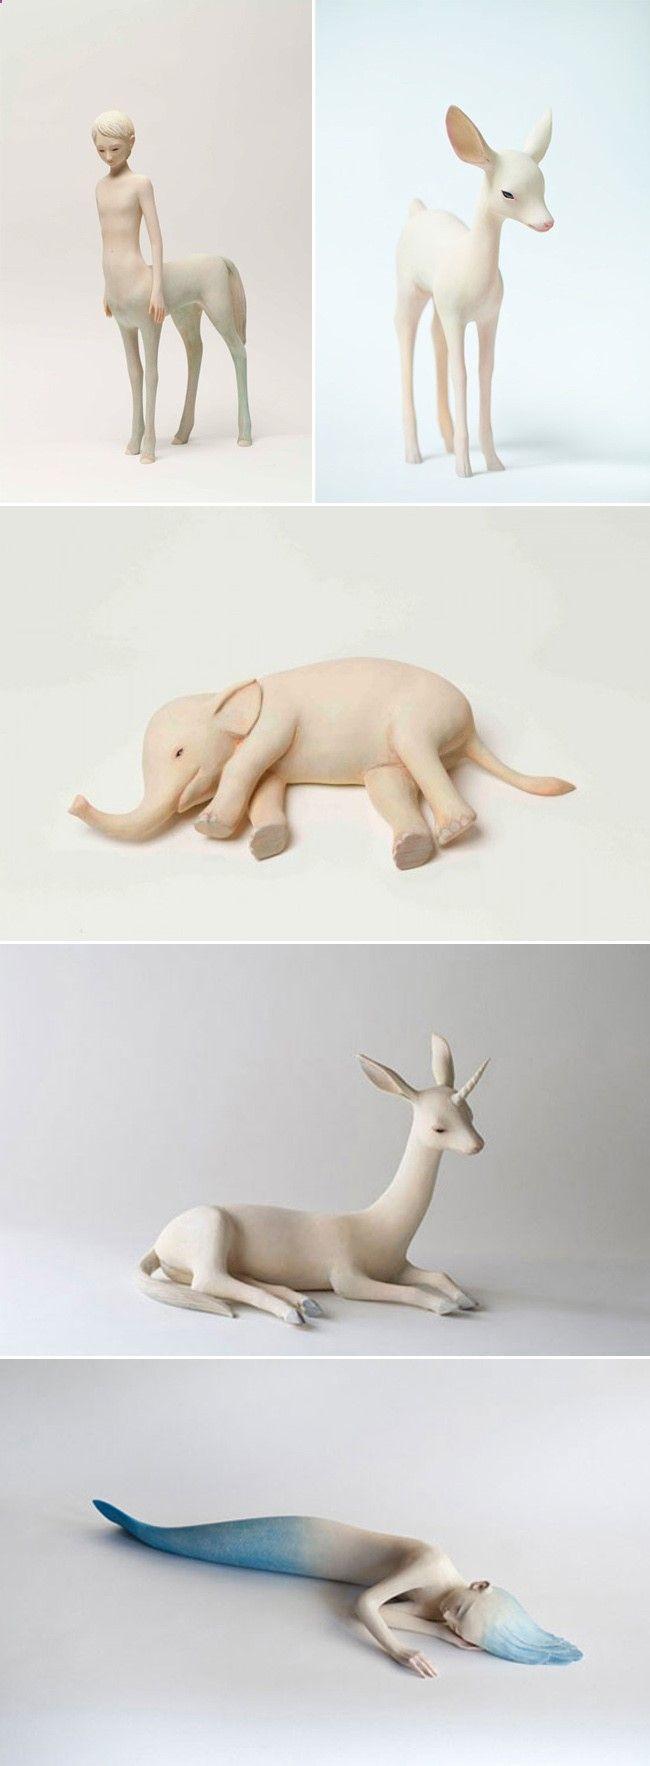 Yoshimasa Tsuchiyas beautiful sculptures